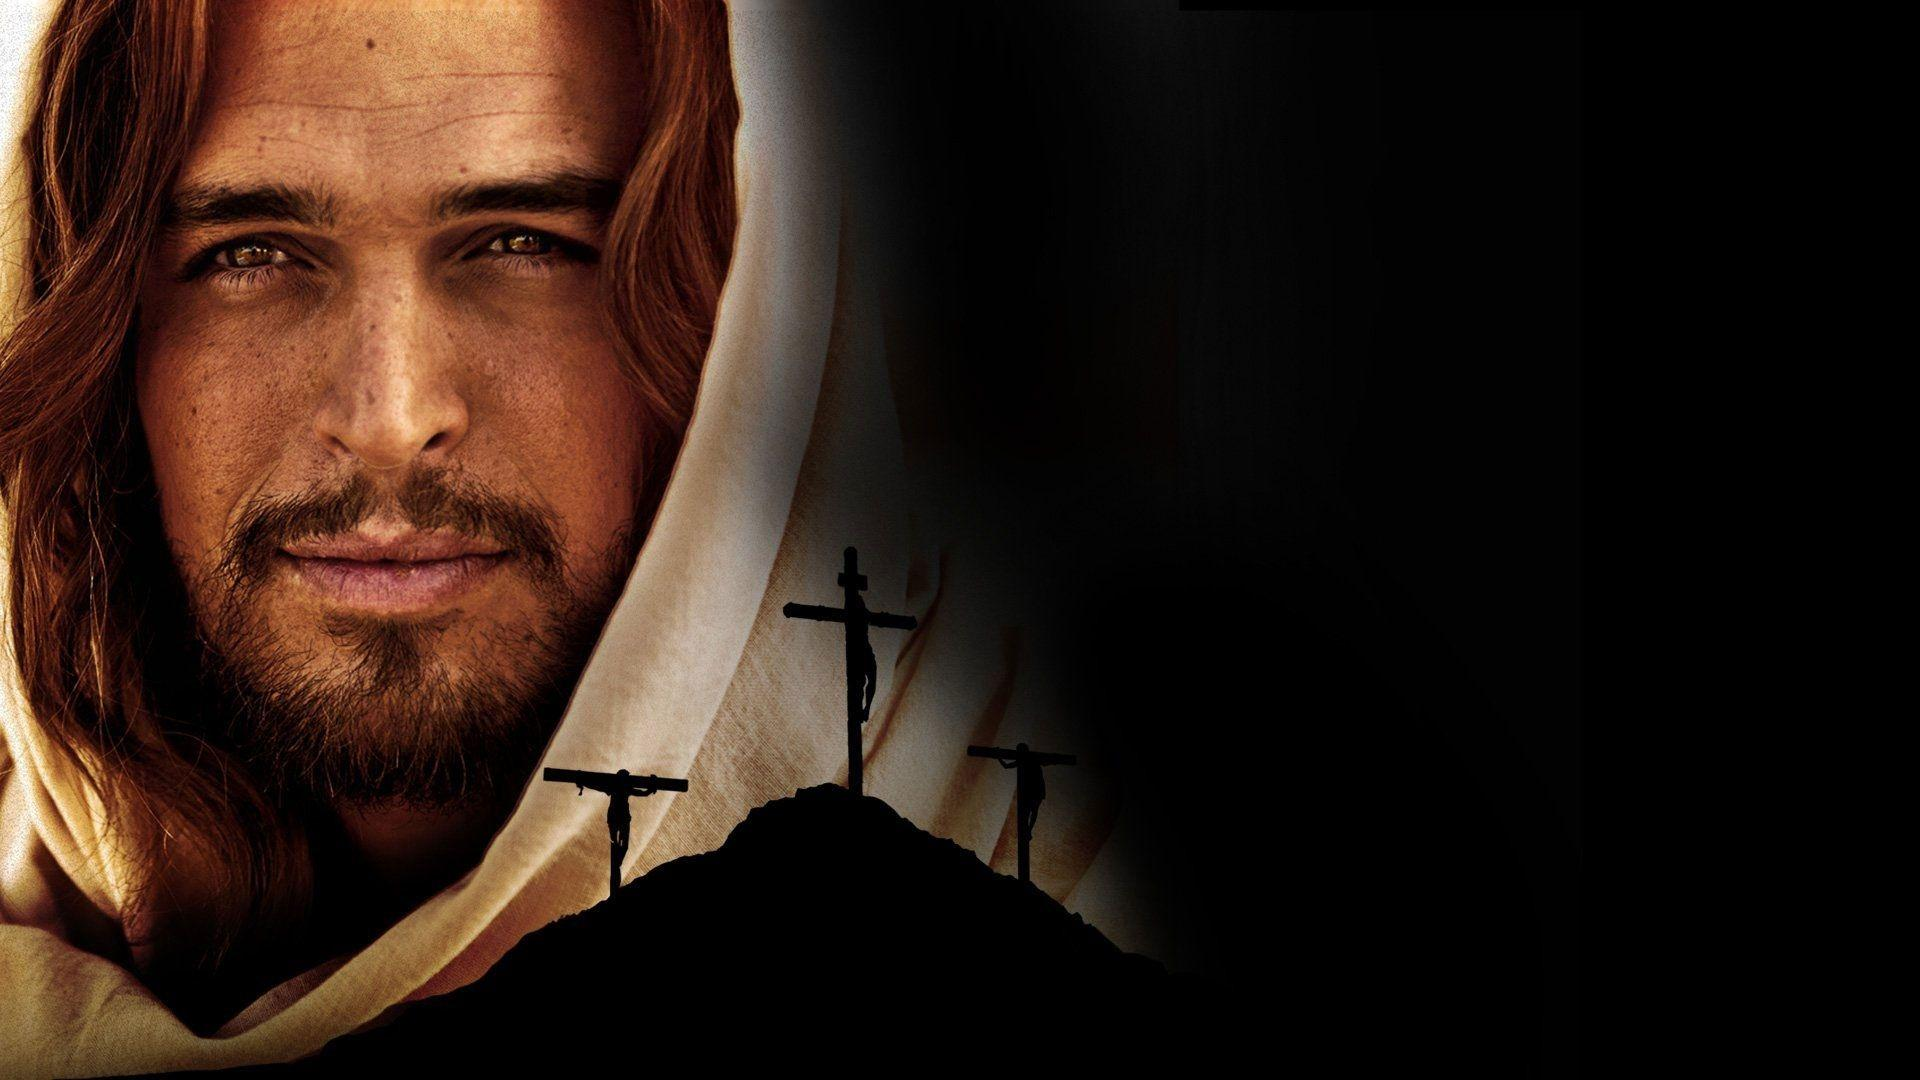 Jesus Christ HD 1080p Wallpapers - Wallpaper Cave